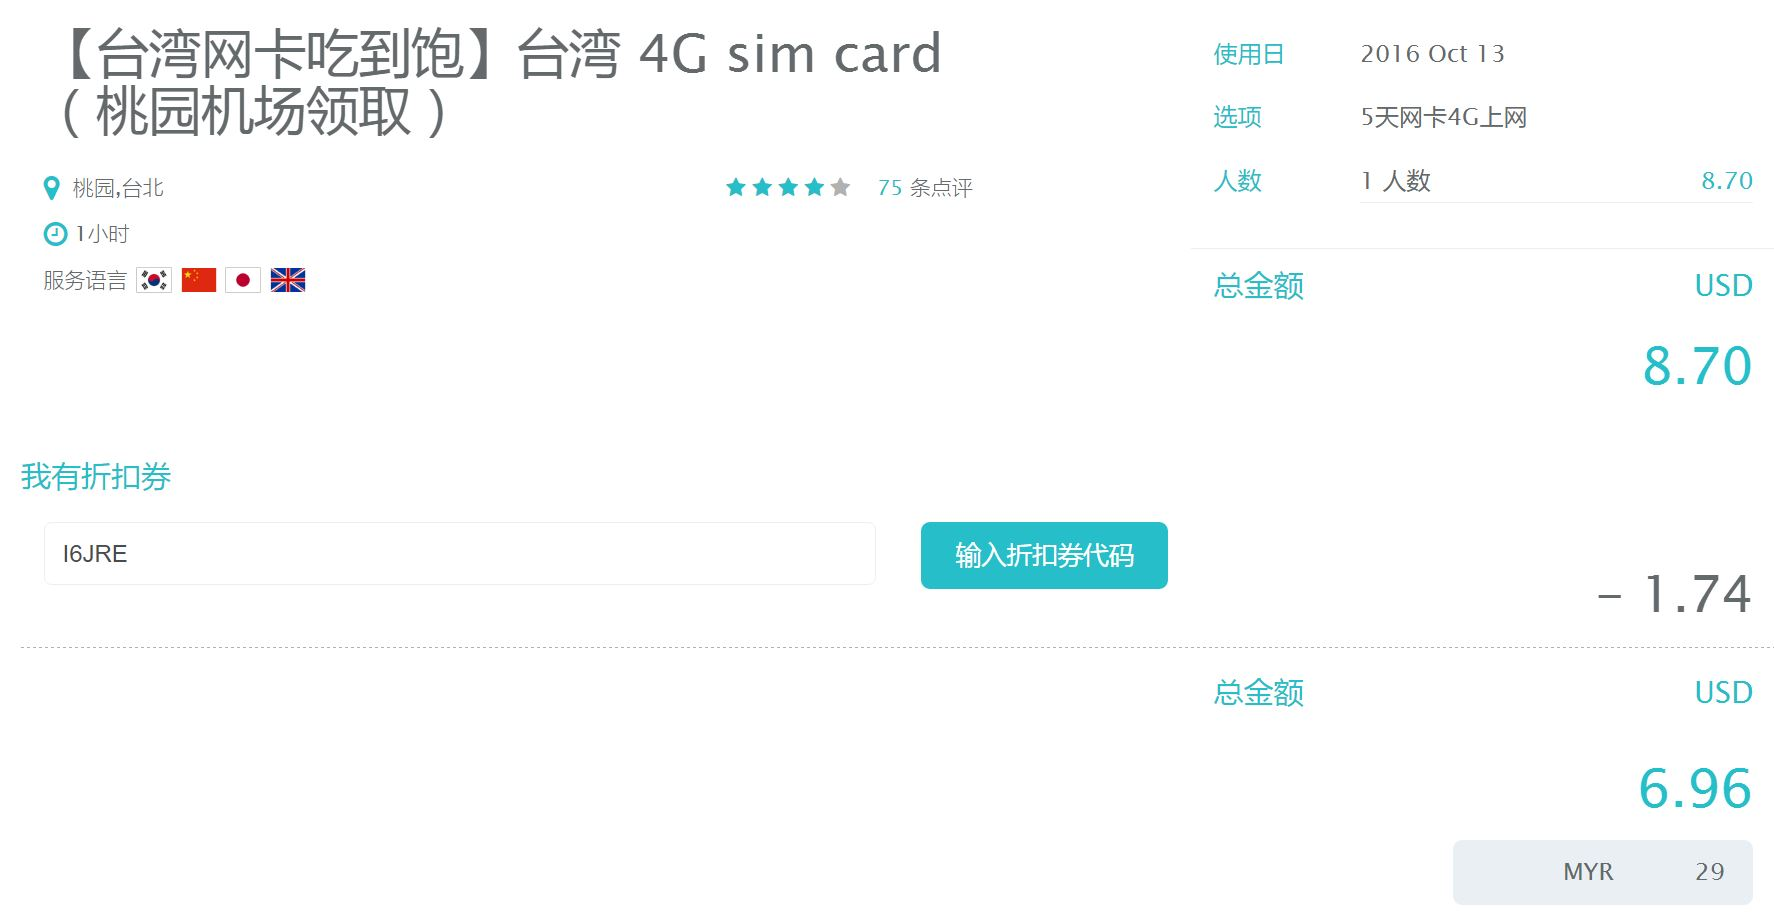 sim-card-rm29-5-days